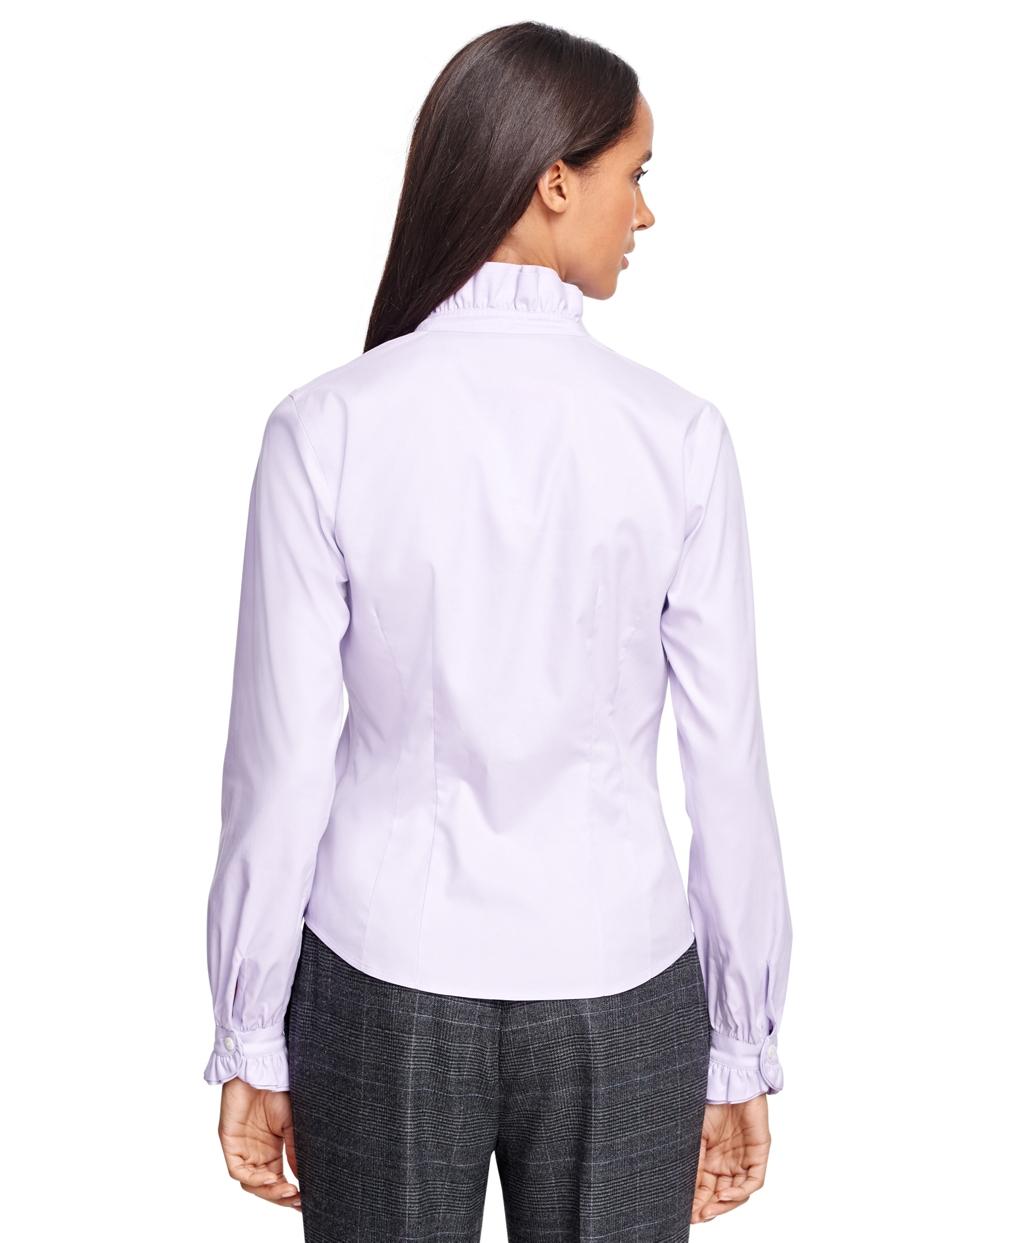 Brooks brothers non iron ruffle collar dress shirt in for Brooks brothers non iron shirts review